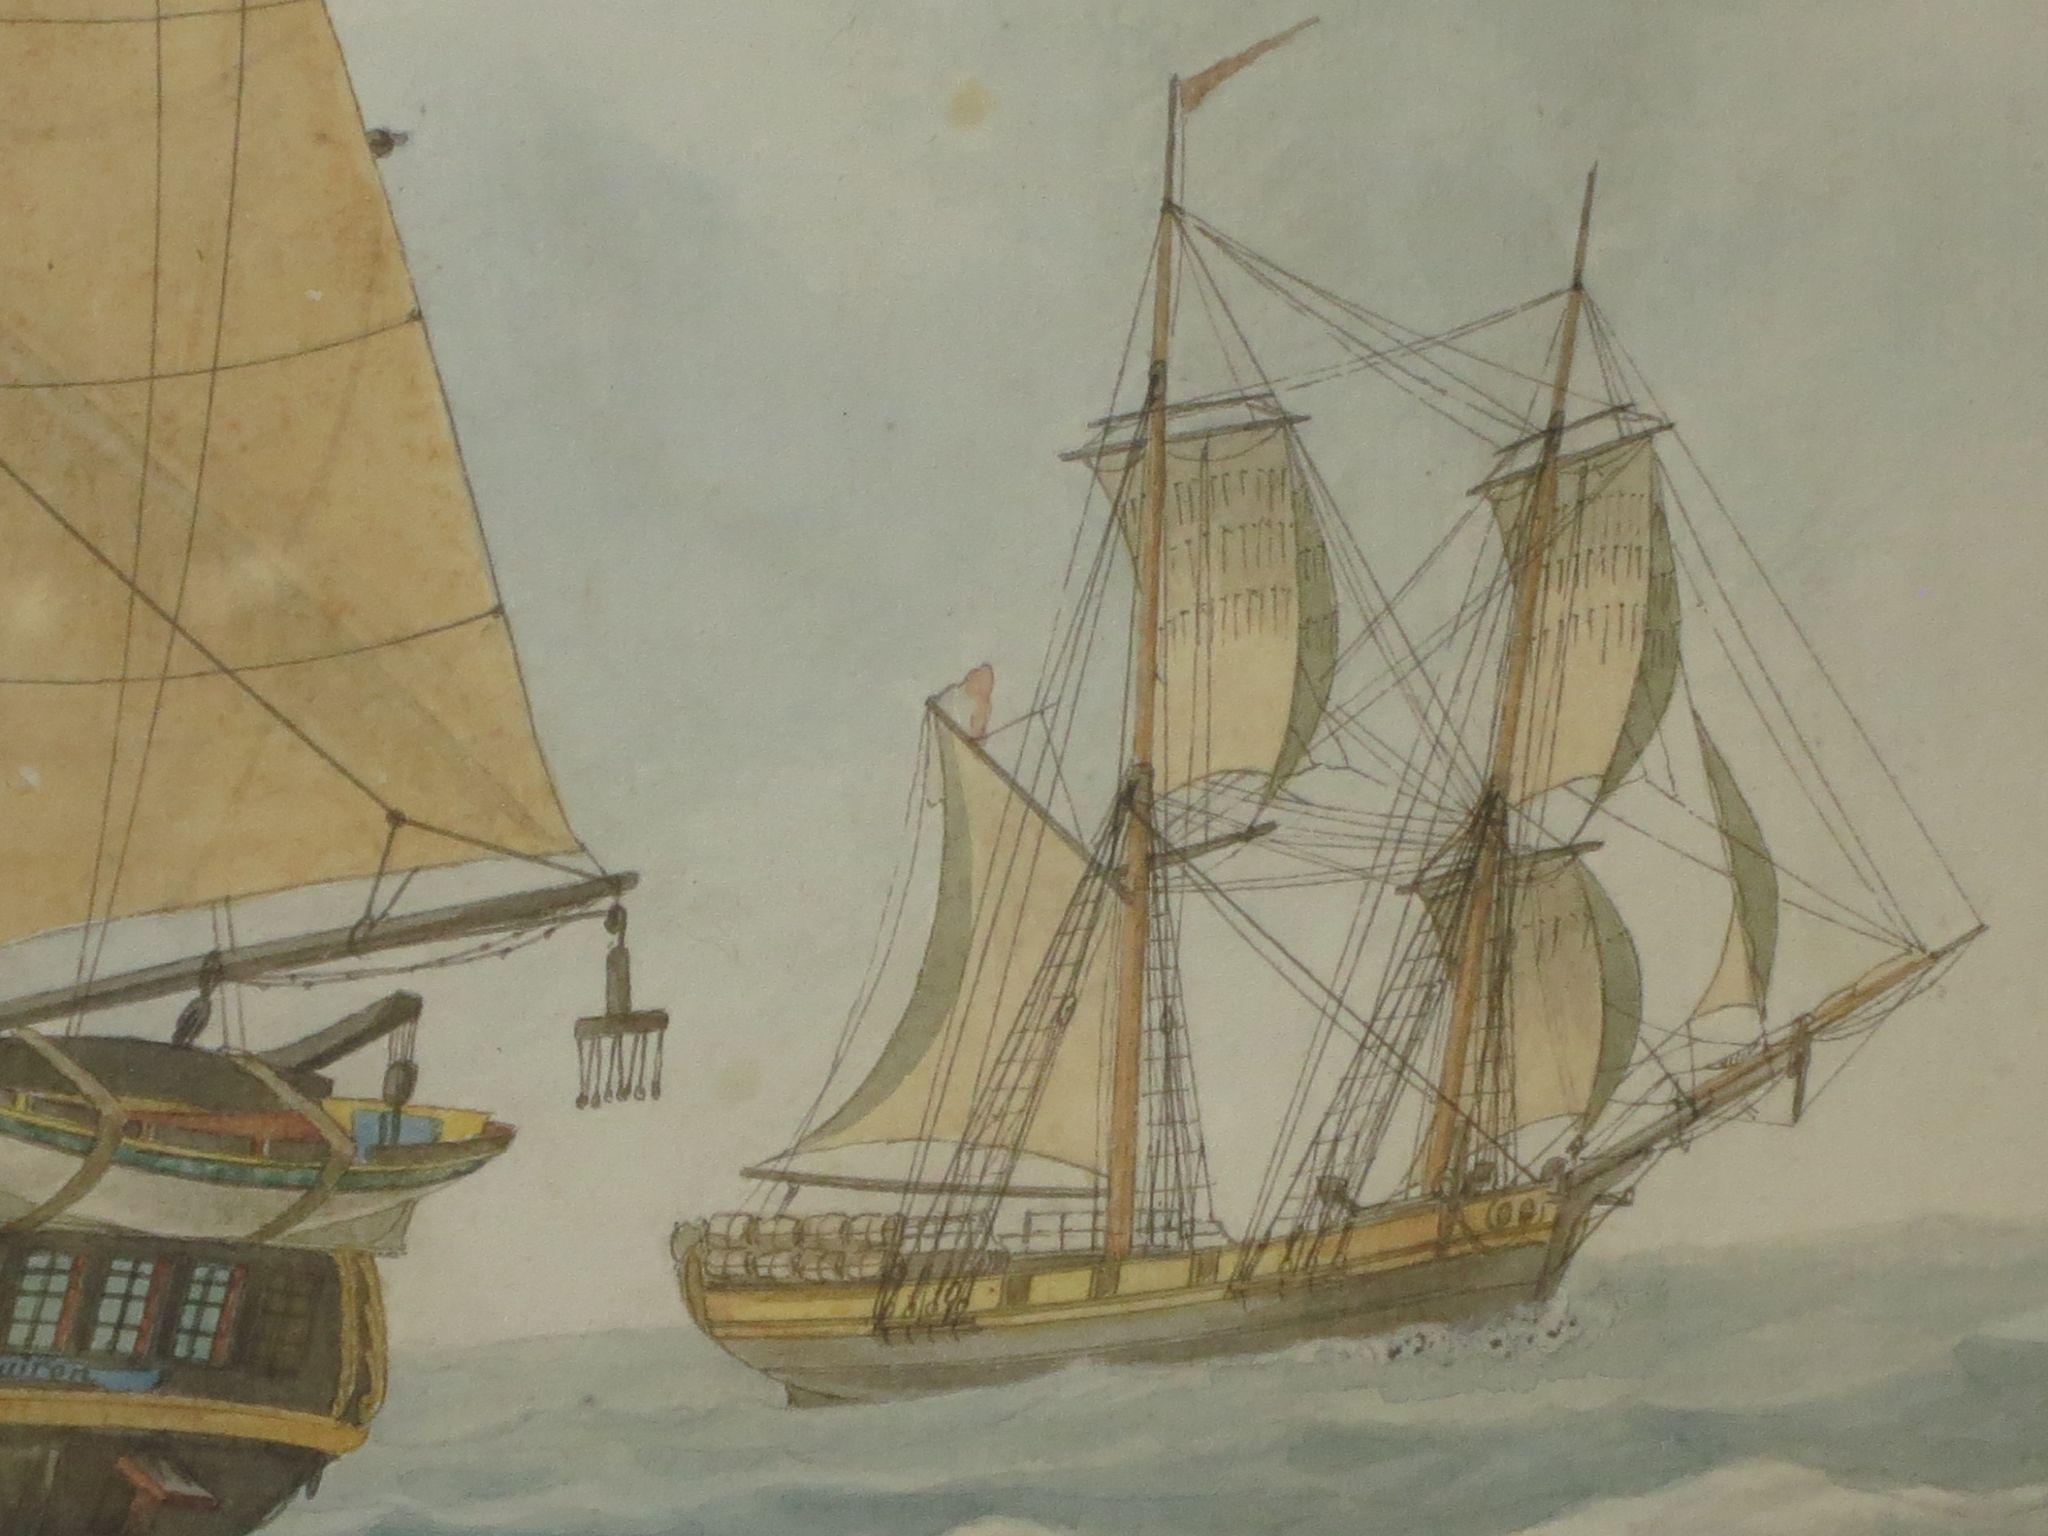 JOSEPH-ANGE ANTOINE ROUX (FRENCH, 1765-1835) - Image 6 of 15